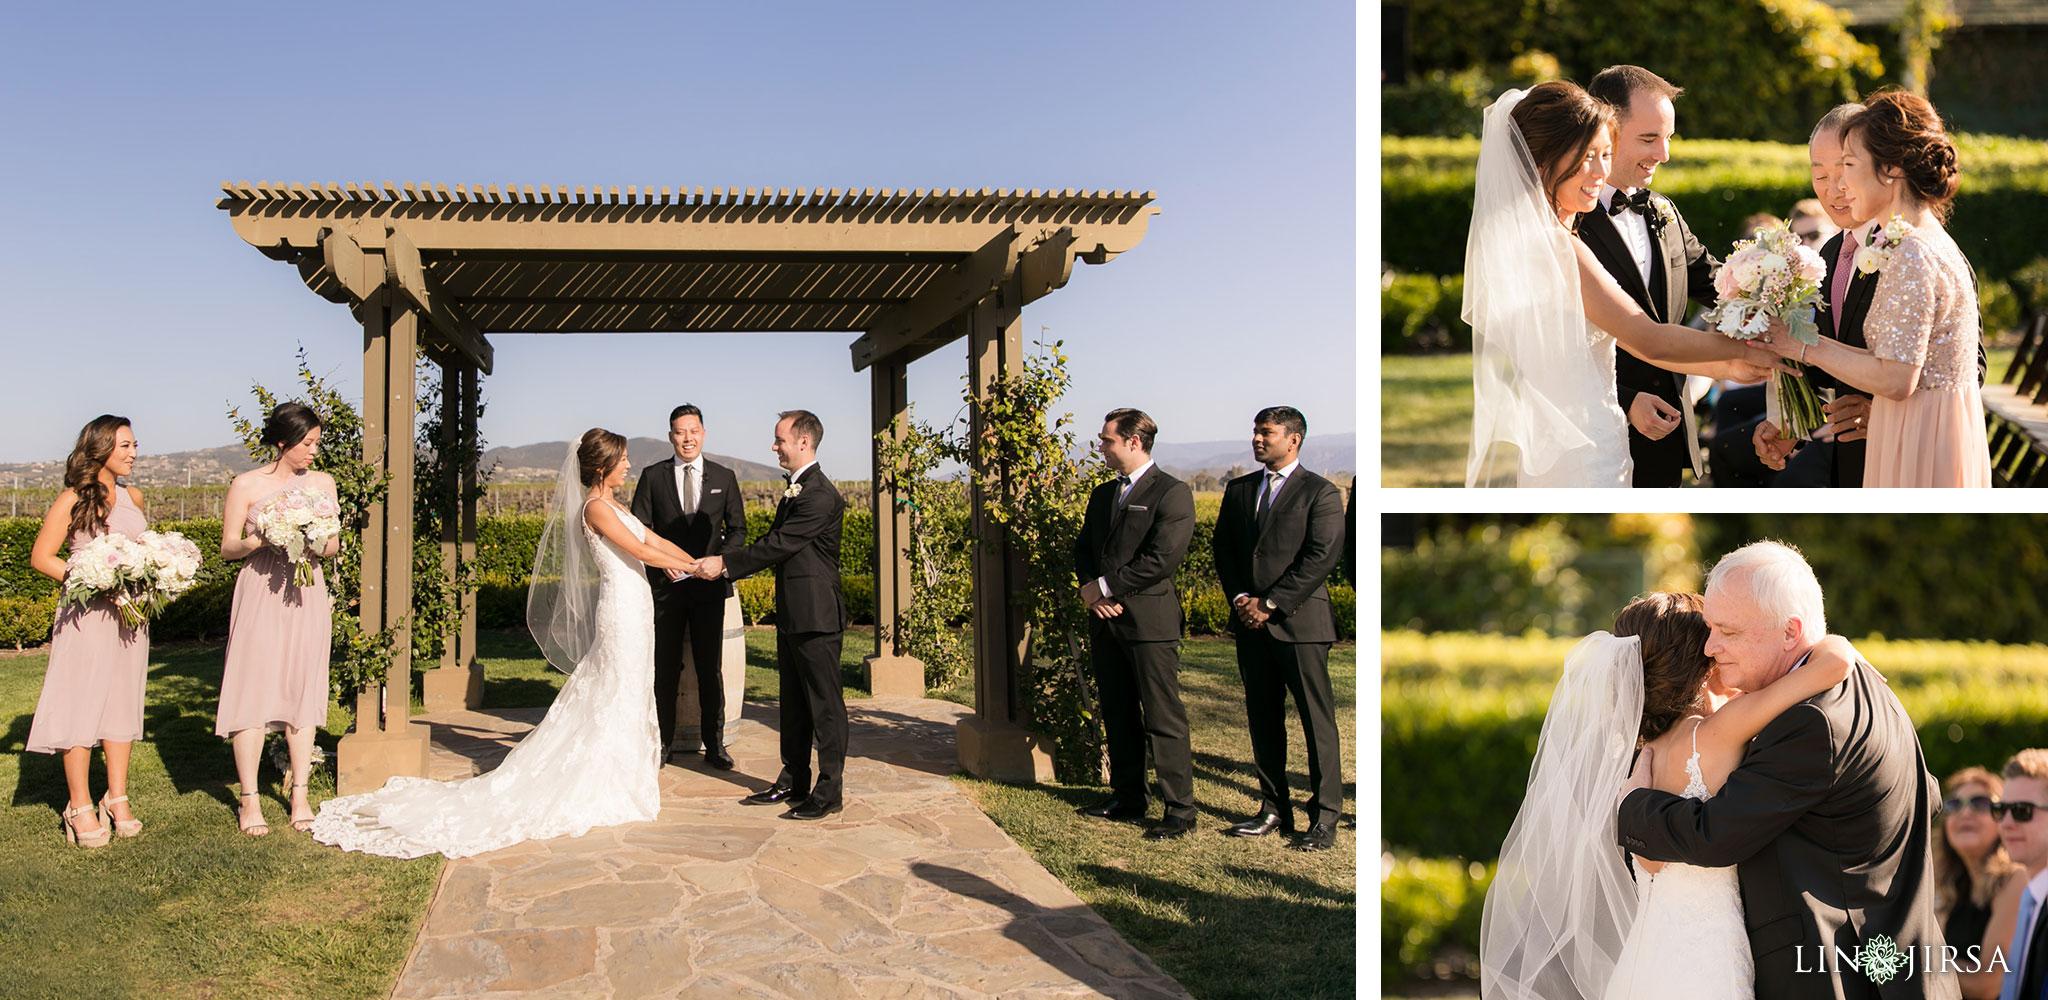 19 Ponte Winery Vineyard Garden Temecula Wedding Ceremony Photography